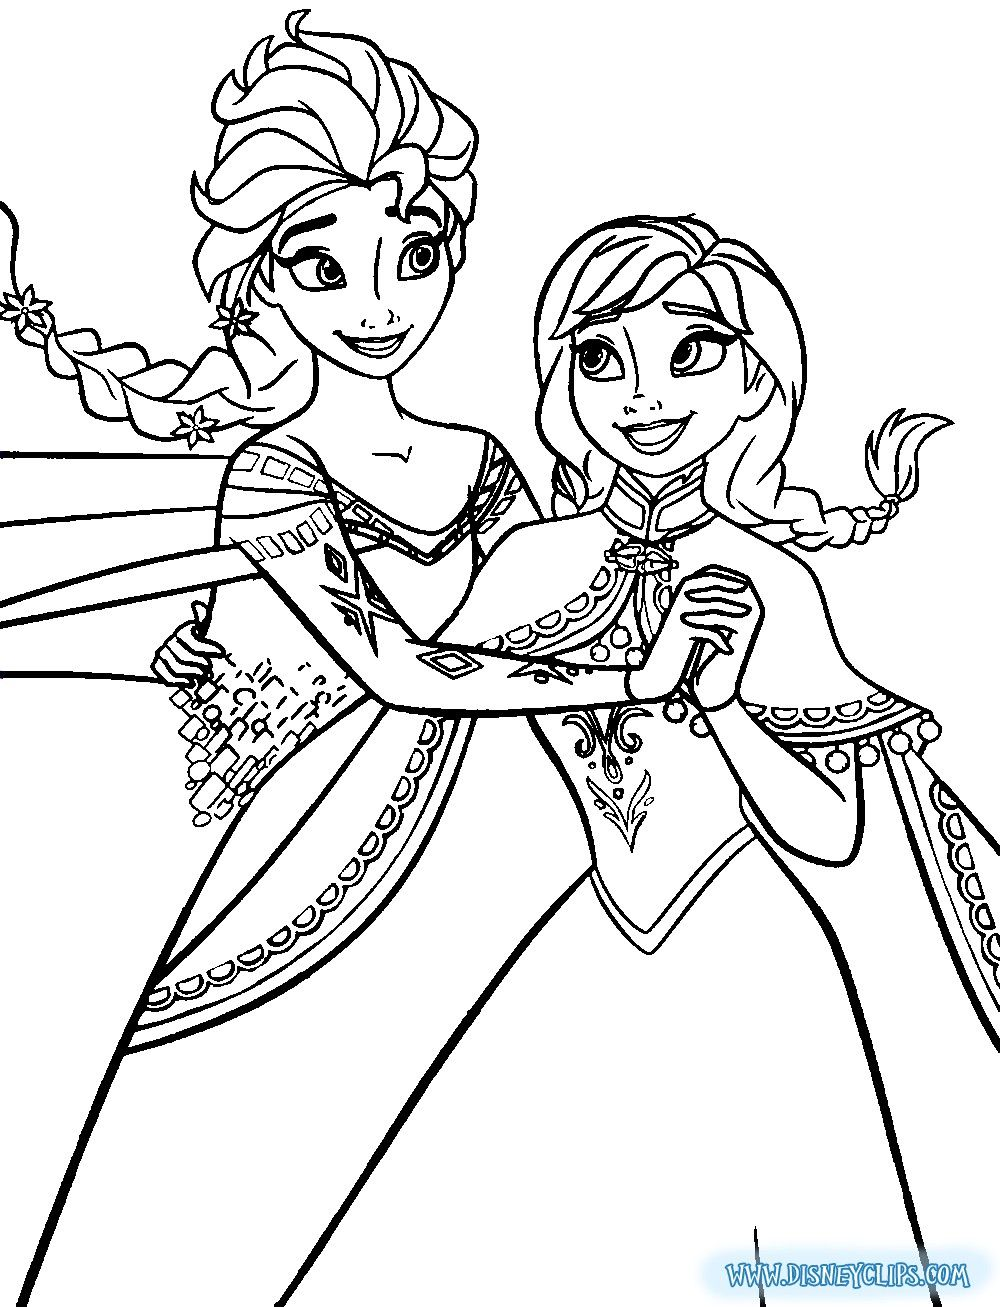 Princess Coloring Pages Frozen Elsa Through The Thousand Images On The Internet Reg Elsa Coloring Pages Disney Princess Coloring Pages Cartoon Coloring Pages